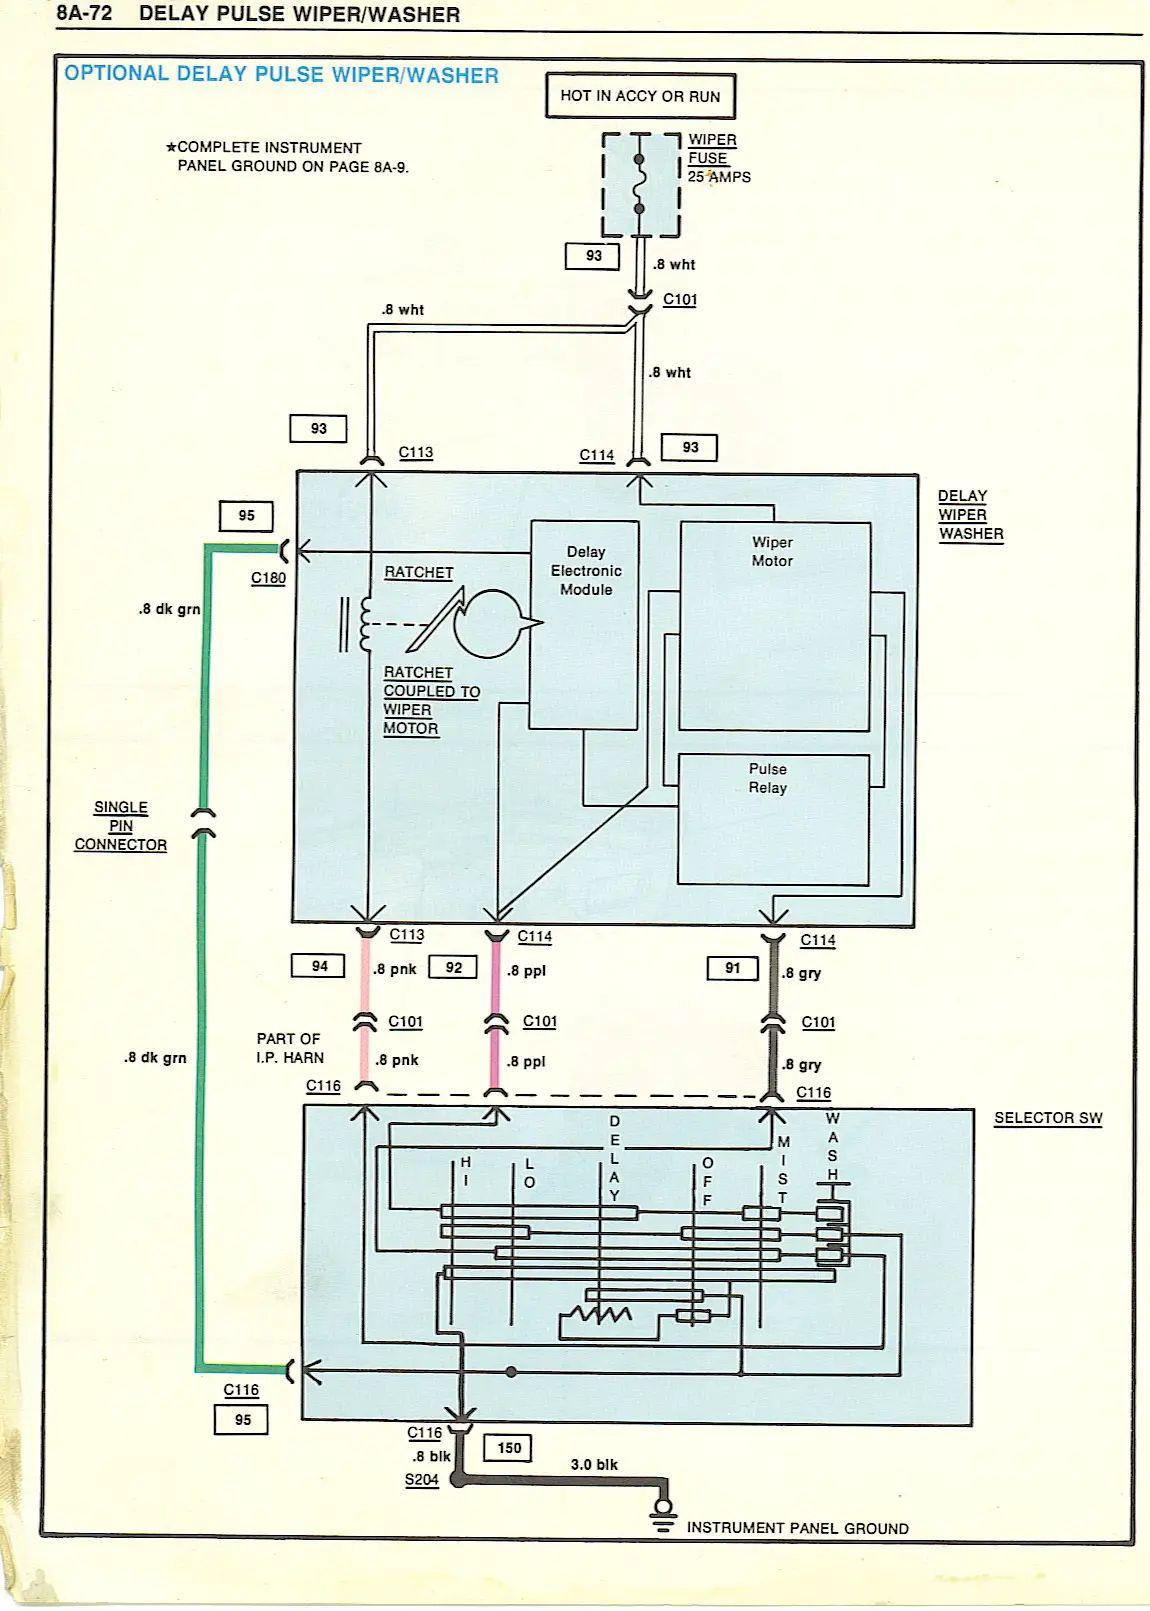 1980 camaro pulse wiper switch wiring diagram